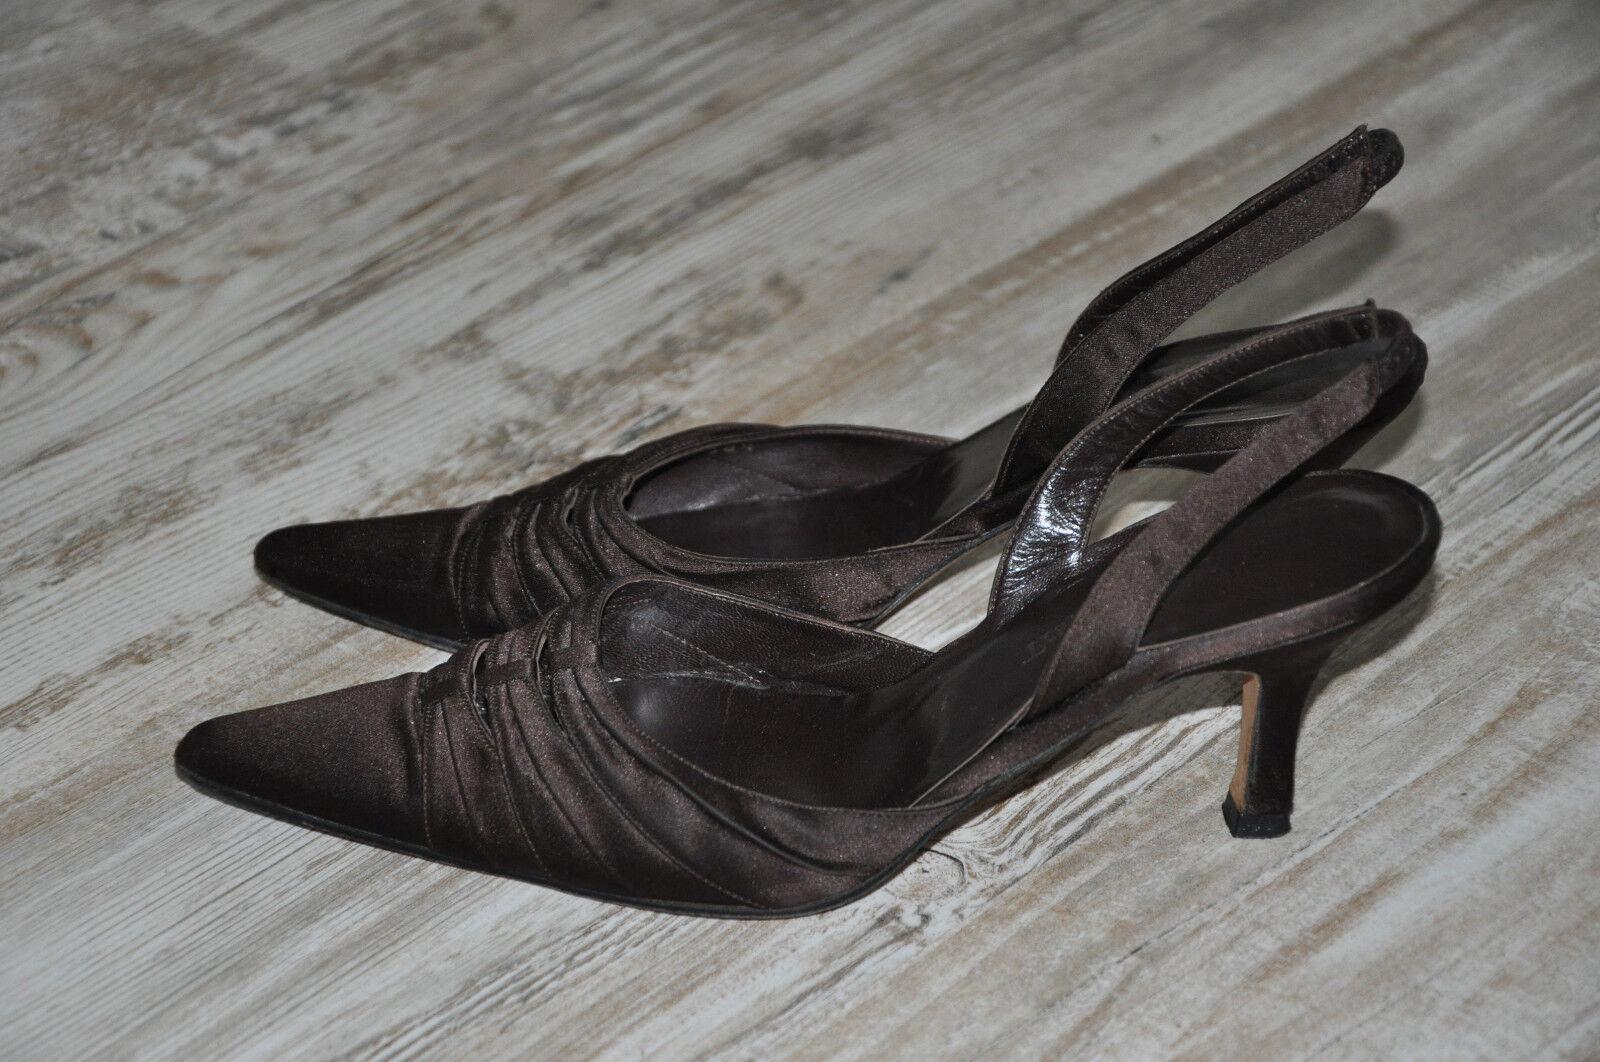 L.K. BENNETT SATIN & LEATHER Slingback heels Sandals shoes s 5.5 38 1 2